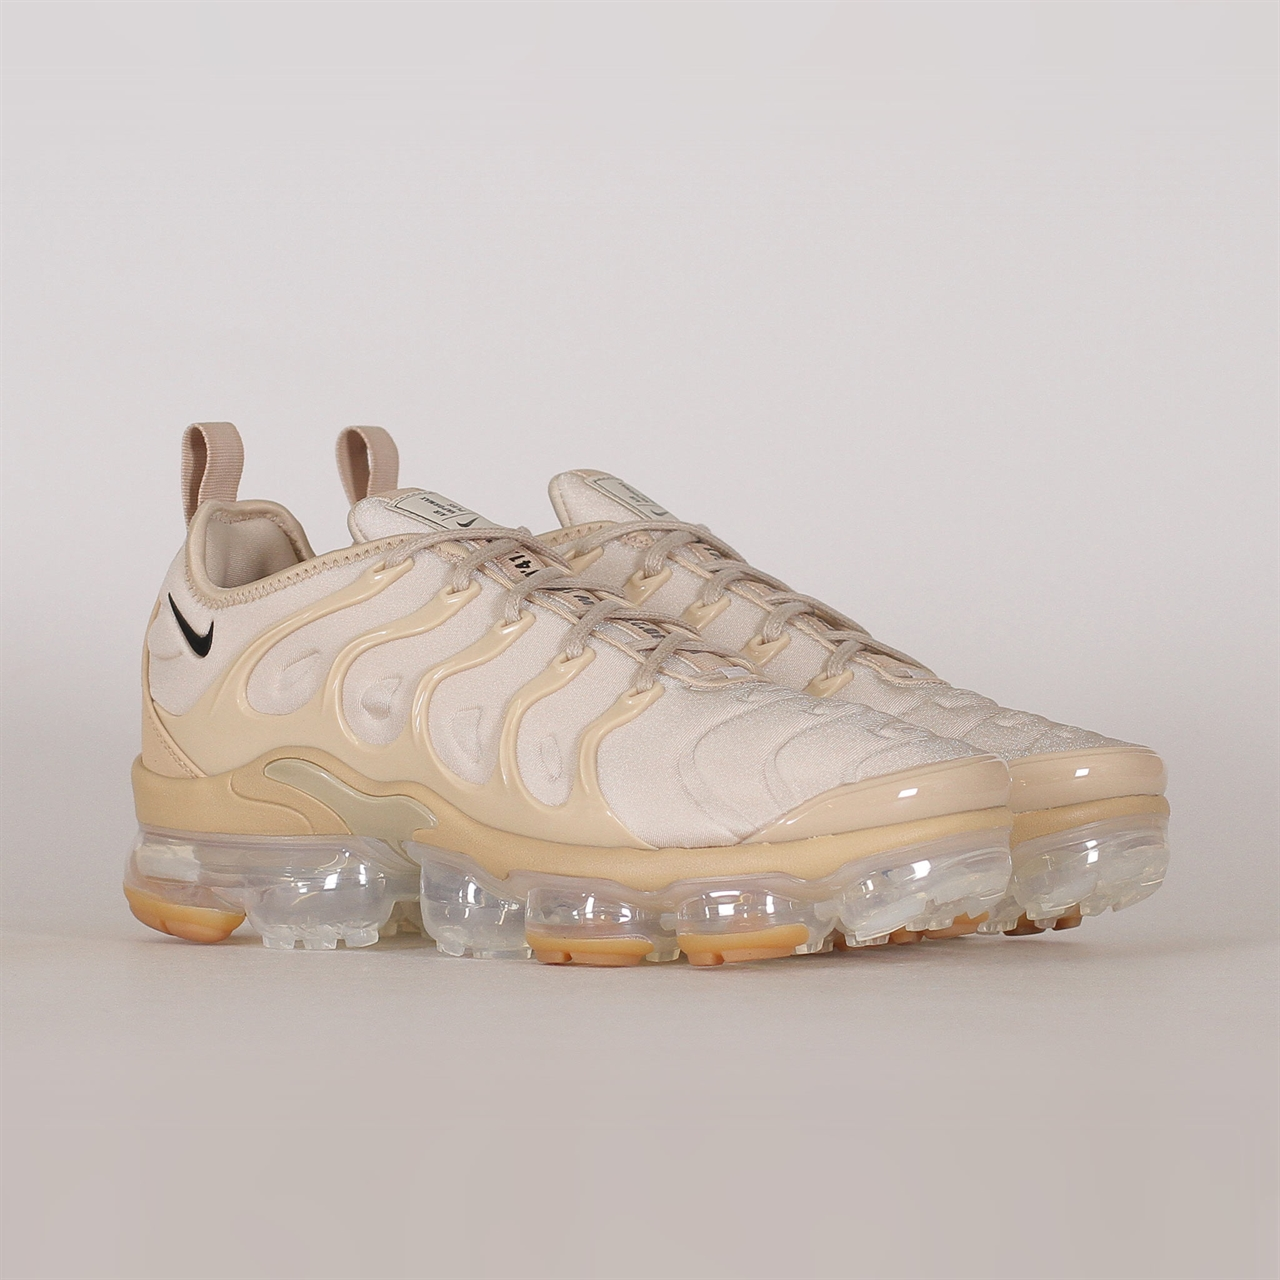 ee3166ee869 Shelta - Nike Sportswear Air Vapormax Plus (AT5681-200)